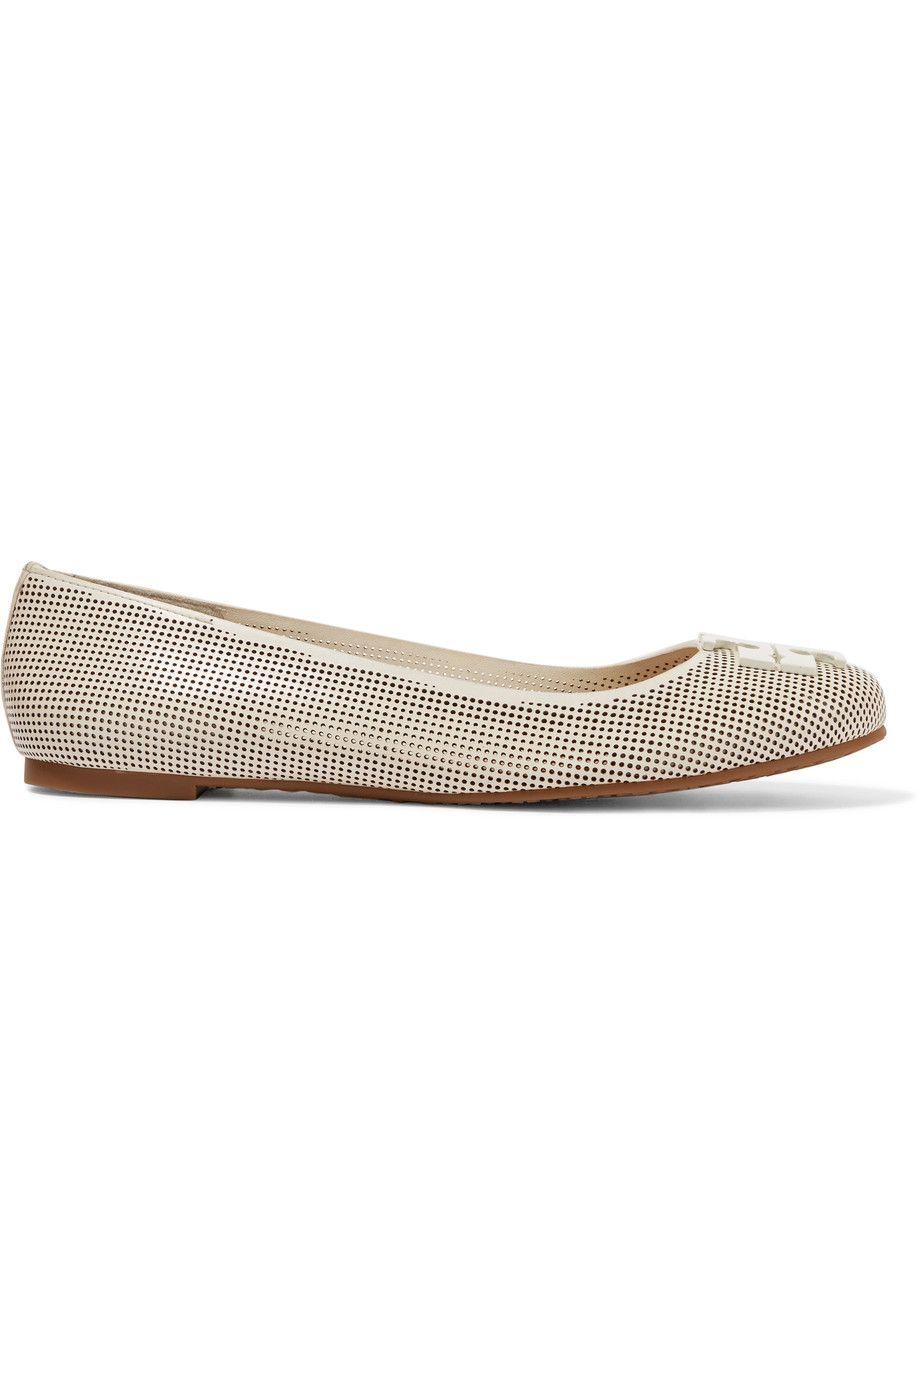 30b736604 TORY BURCH . #toryburch #shoes #flats | Tory Burch | Tory burch ...